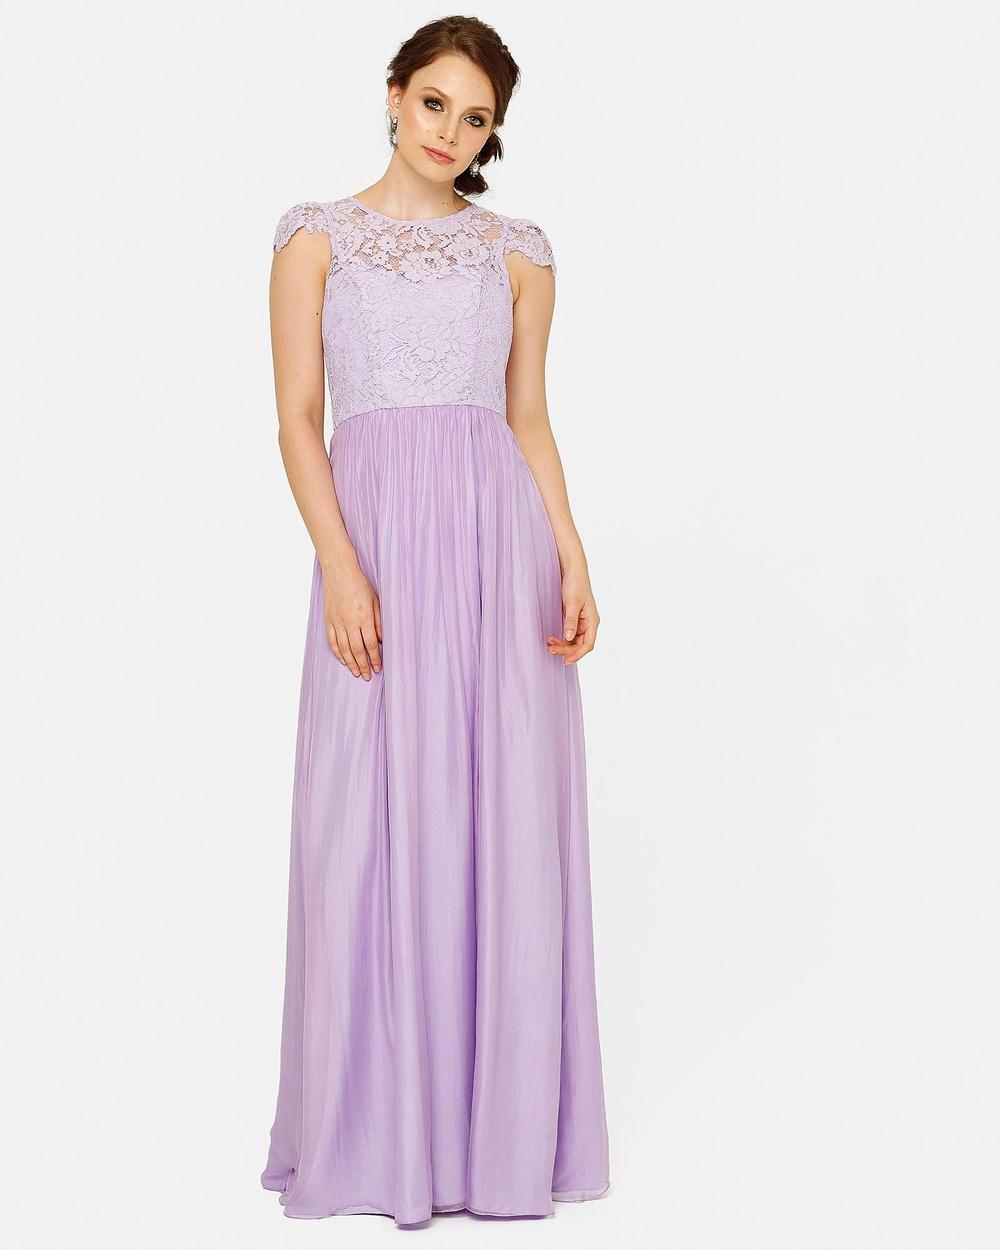 Tania Olsen Designs Latitia Dress Bridesmaid Dresses Lilac Latitia Dress